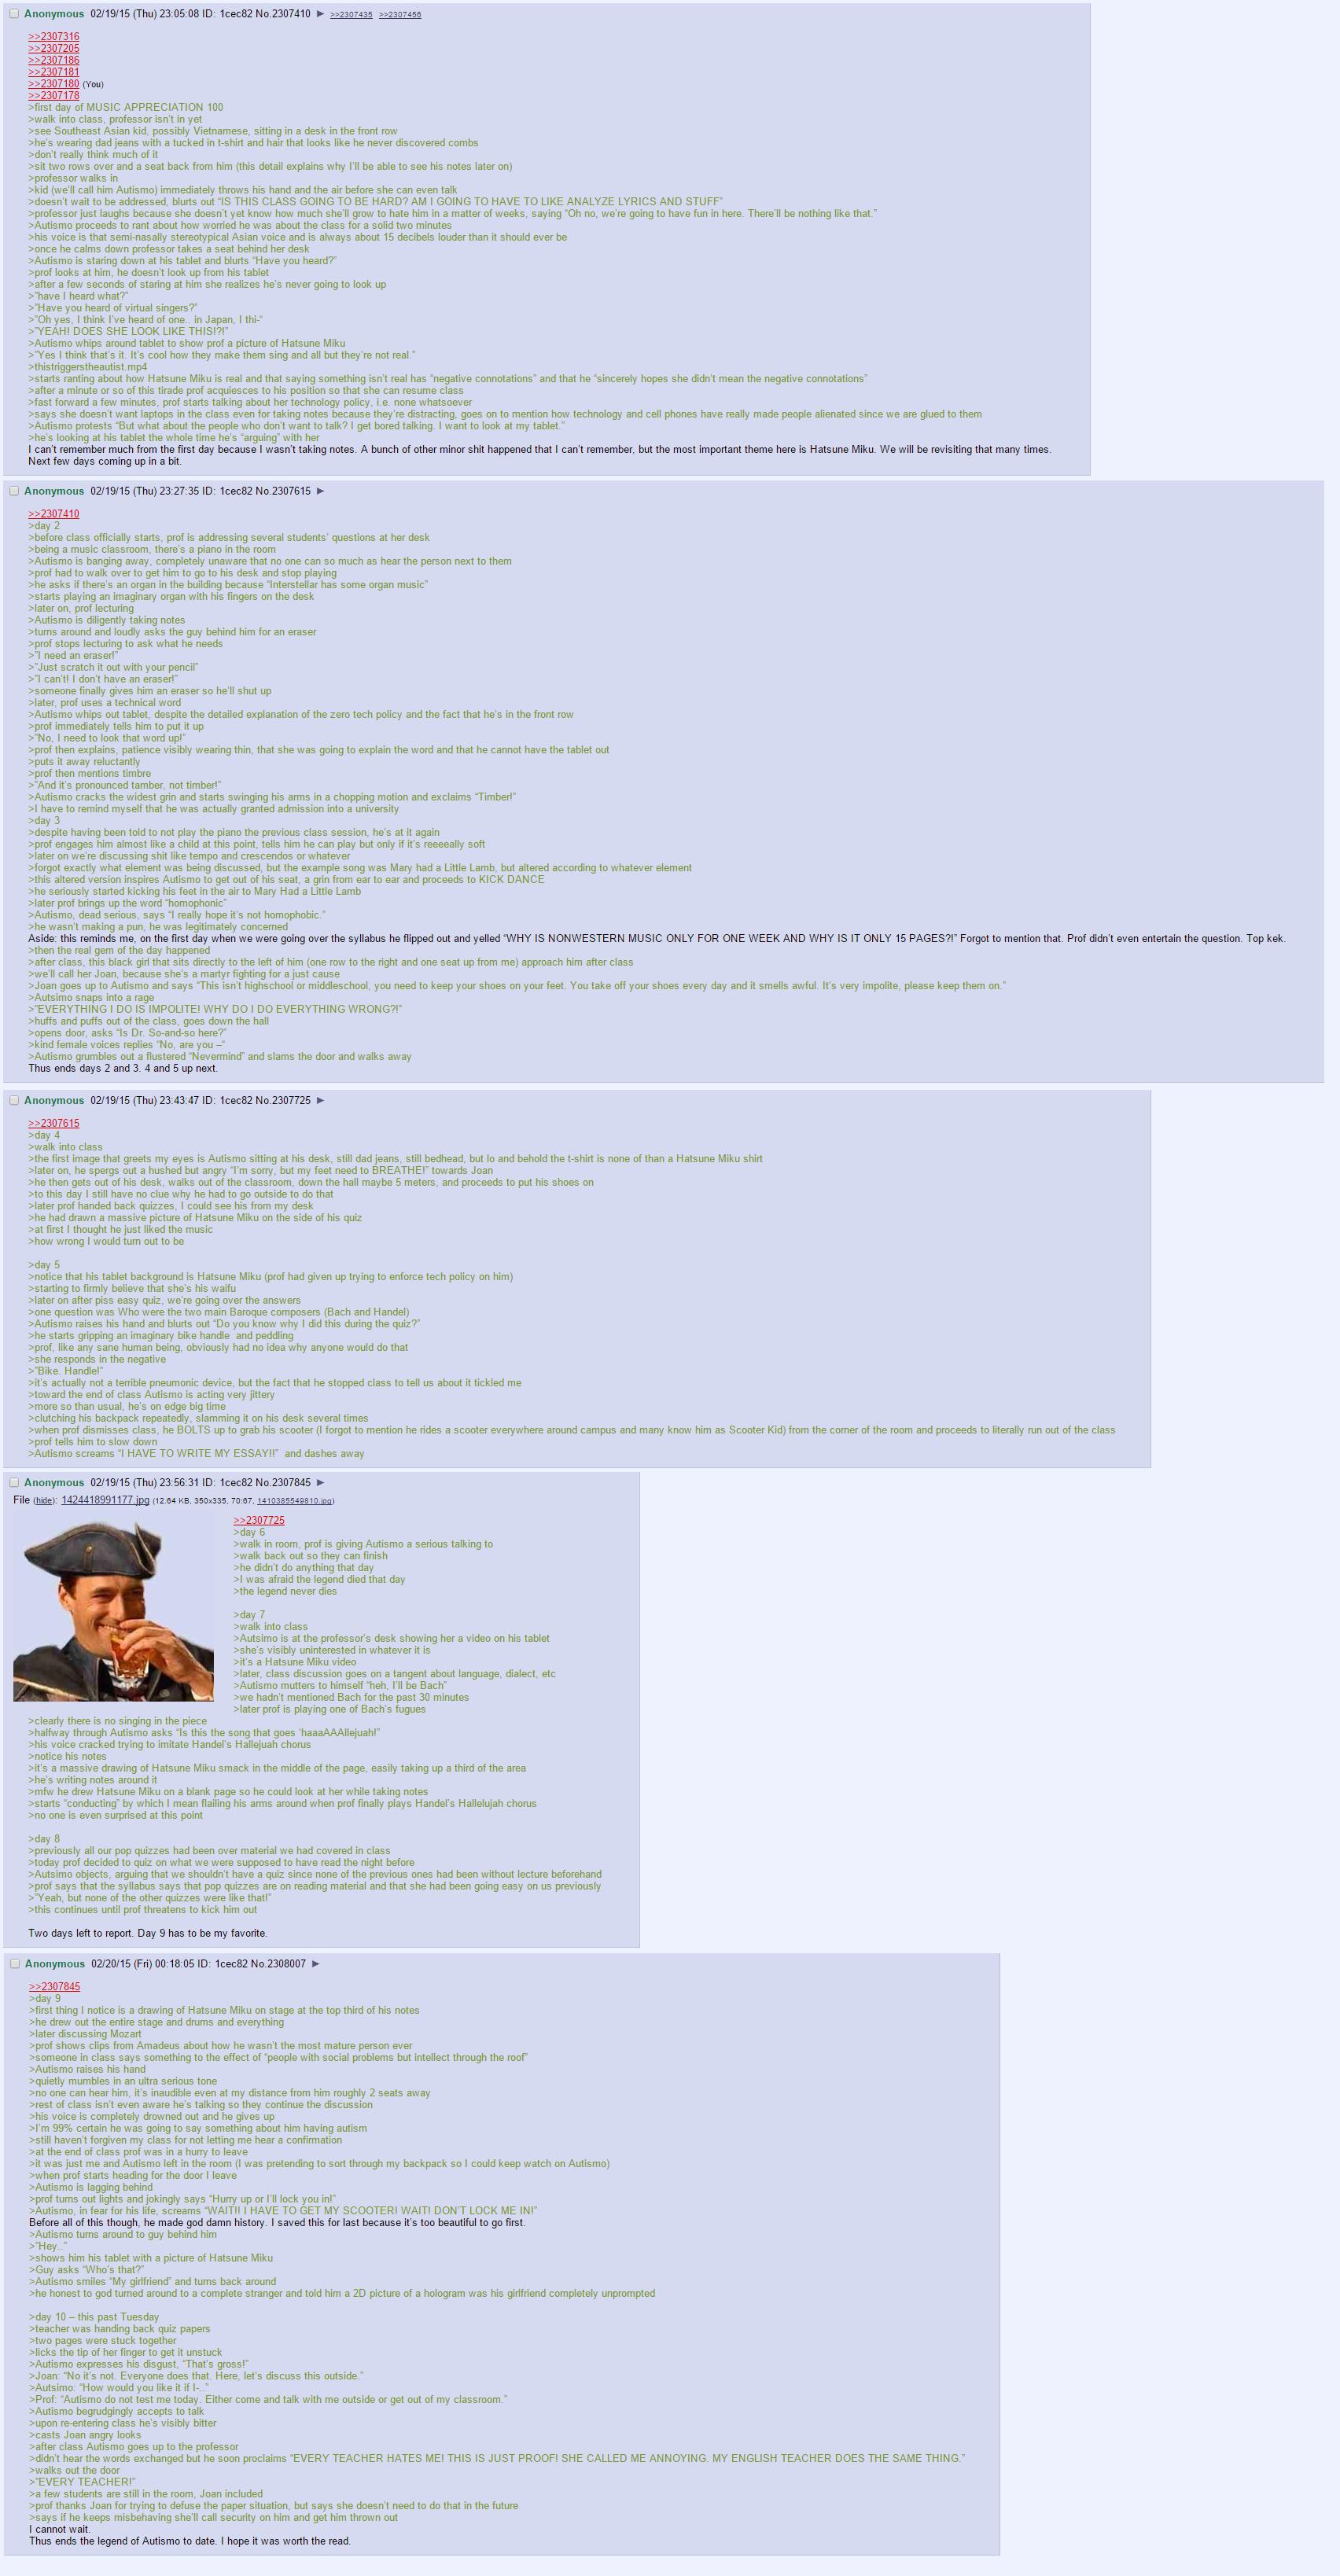 4chan anon